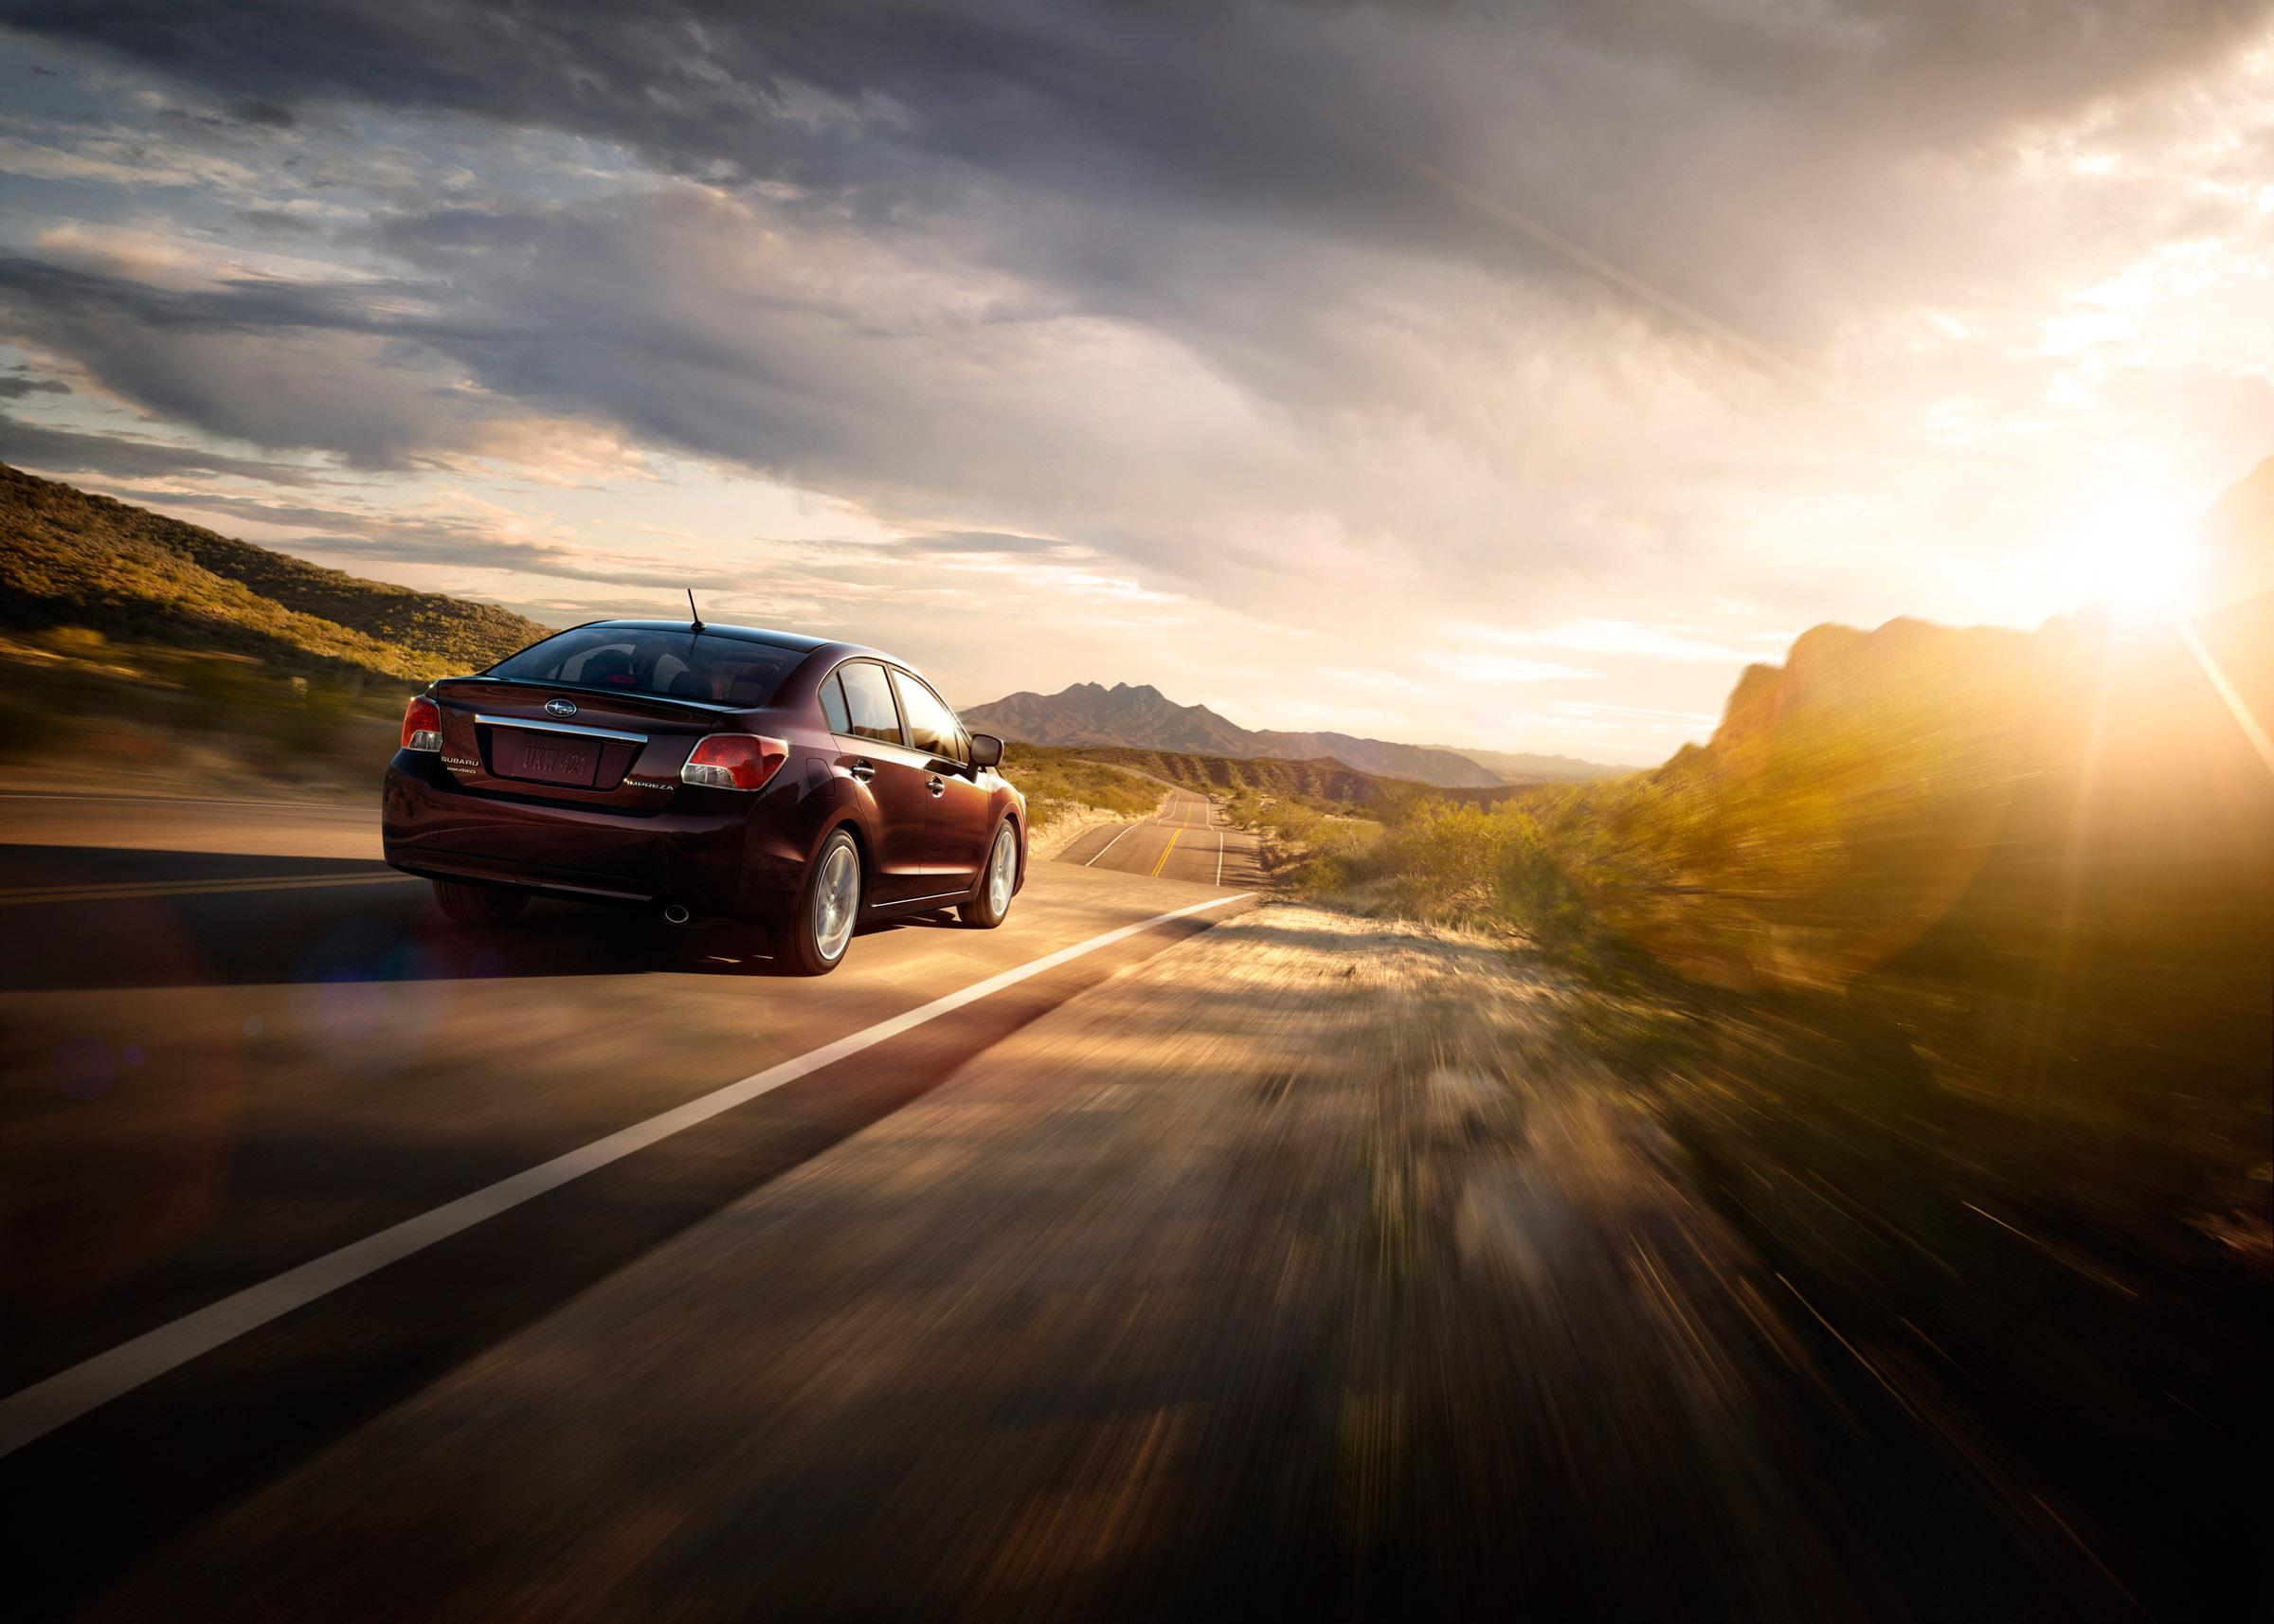 2012 - Subaru Impreza 2-0i лимитированная четвертая версия (фотографии) - фотография №2